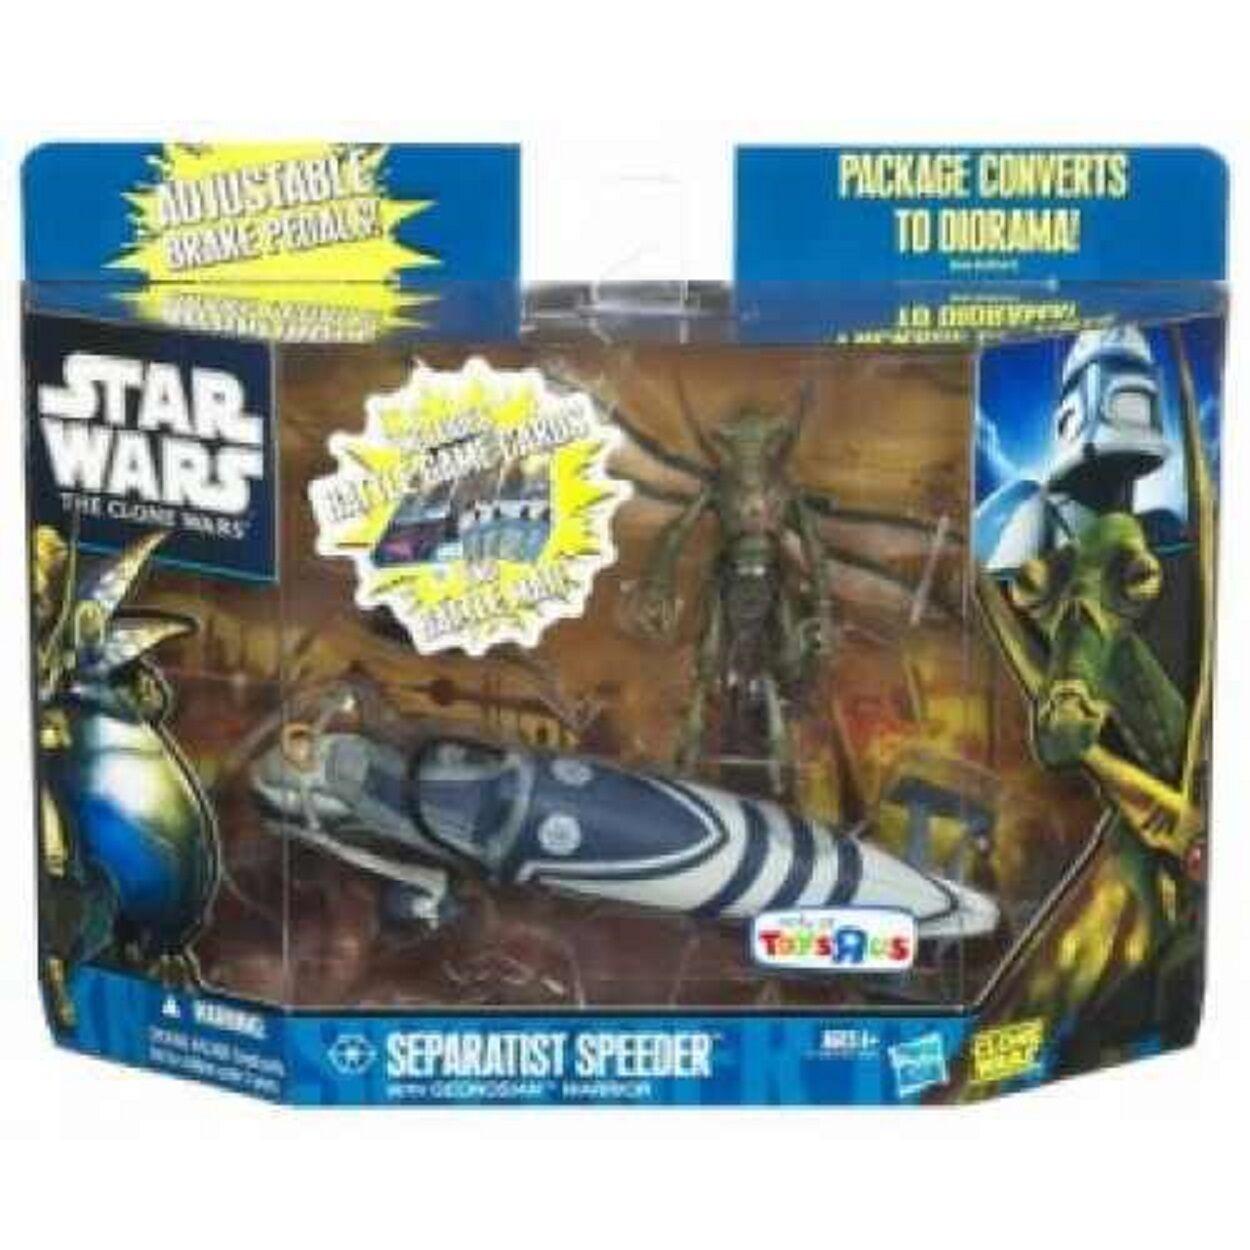 Star Wars Exclusive Separatist Speeder + Geonosian Warrior figure new